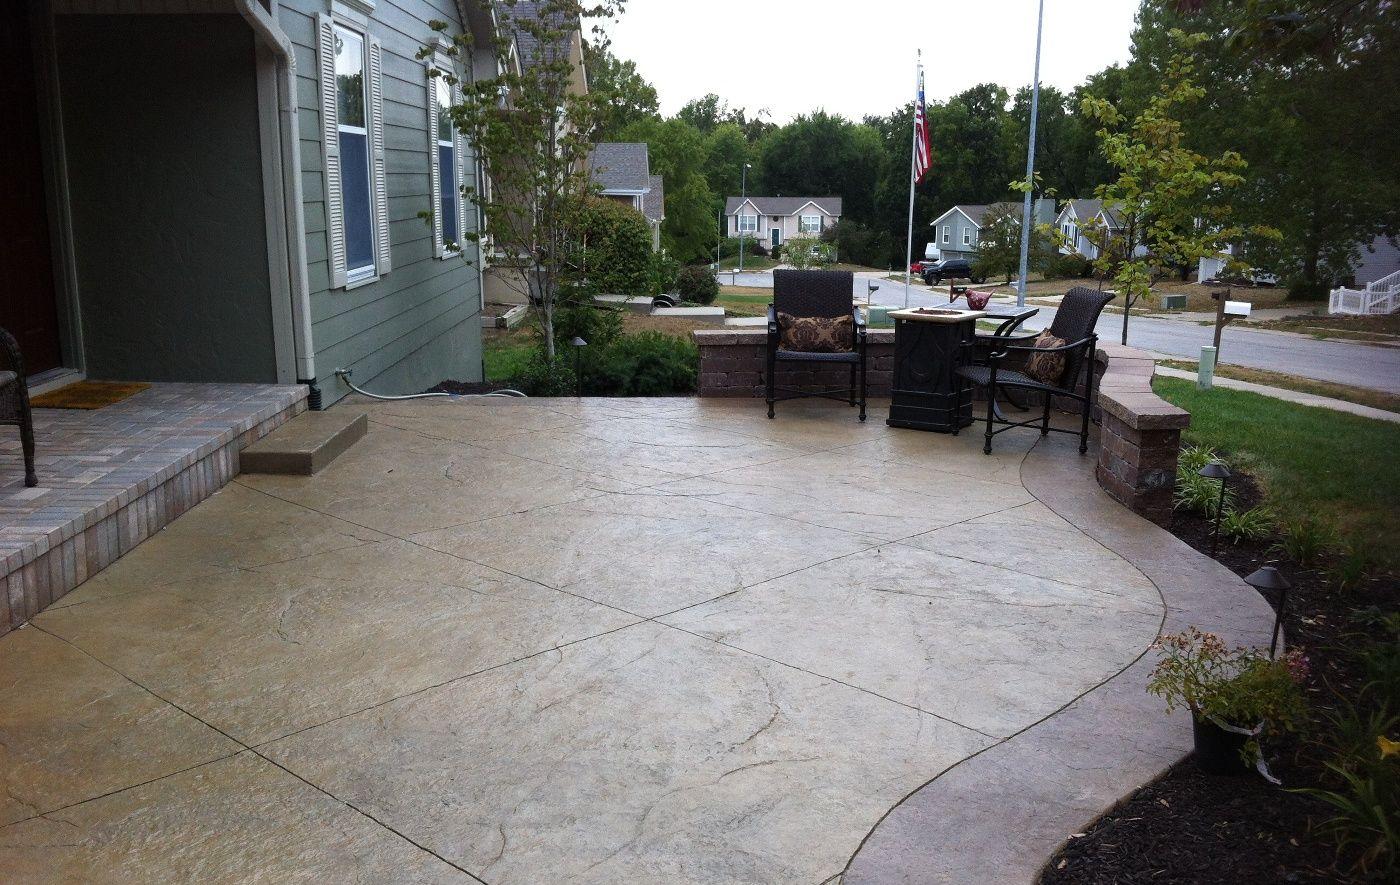 Simple decorative concrete patio #decorativeconcrete ... on Simple Concrete Patio Designs id=47193